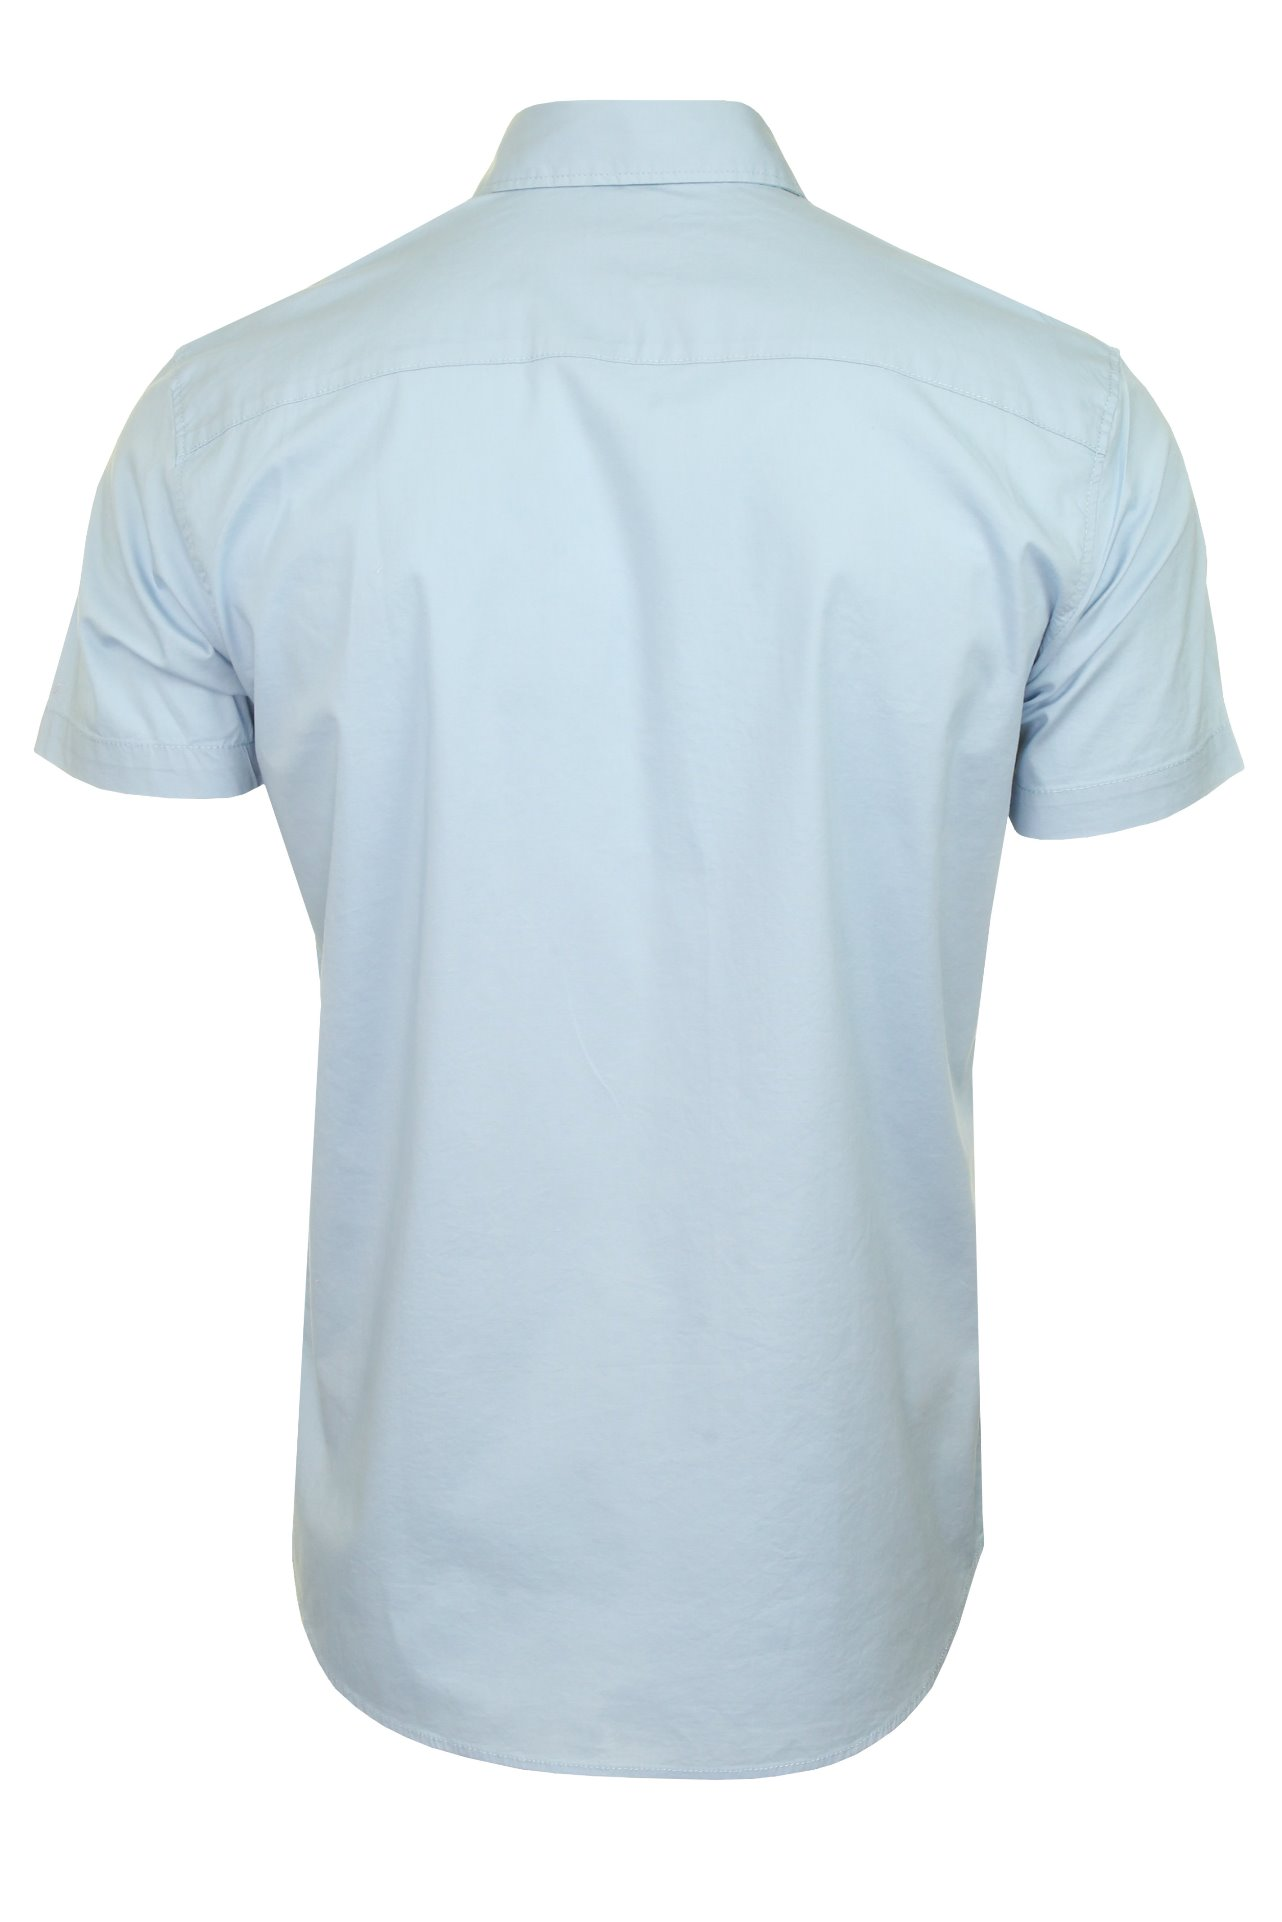 Jack-amp-Jones-Mens-039-Clint-039-Poplin-Shirt-Short-Sleeved thumbnail 8